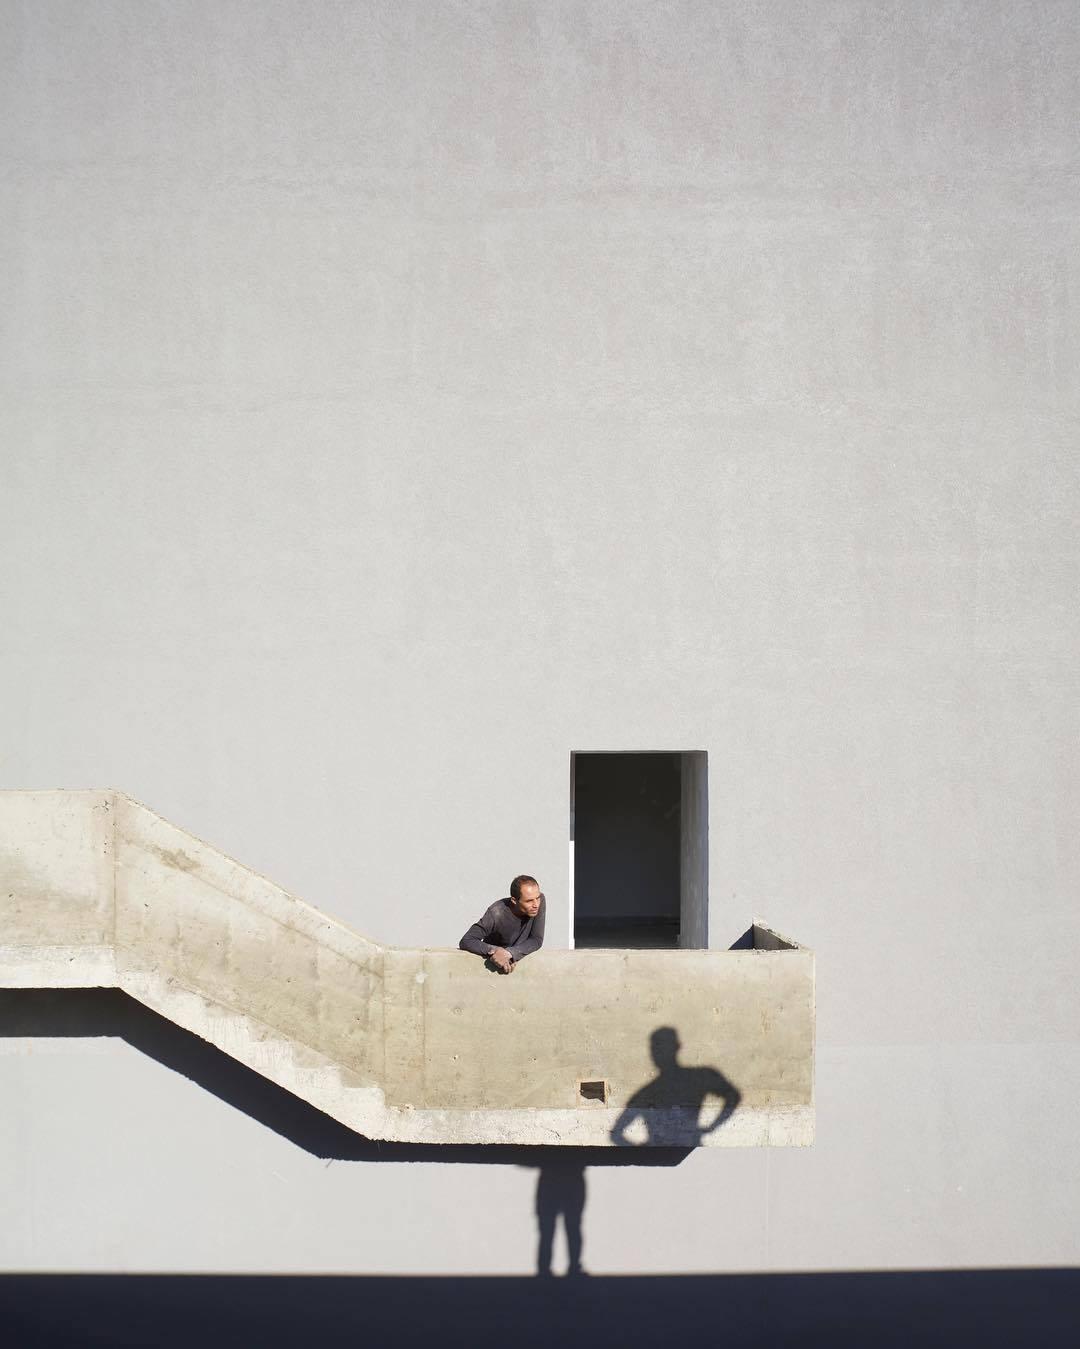 rgb_creative_ideas_design_photography_architecture_Serge_Najjar_01